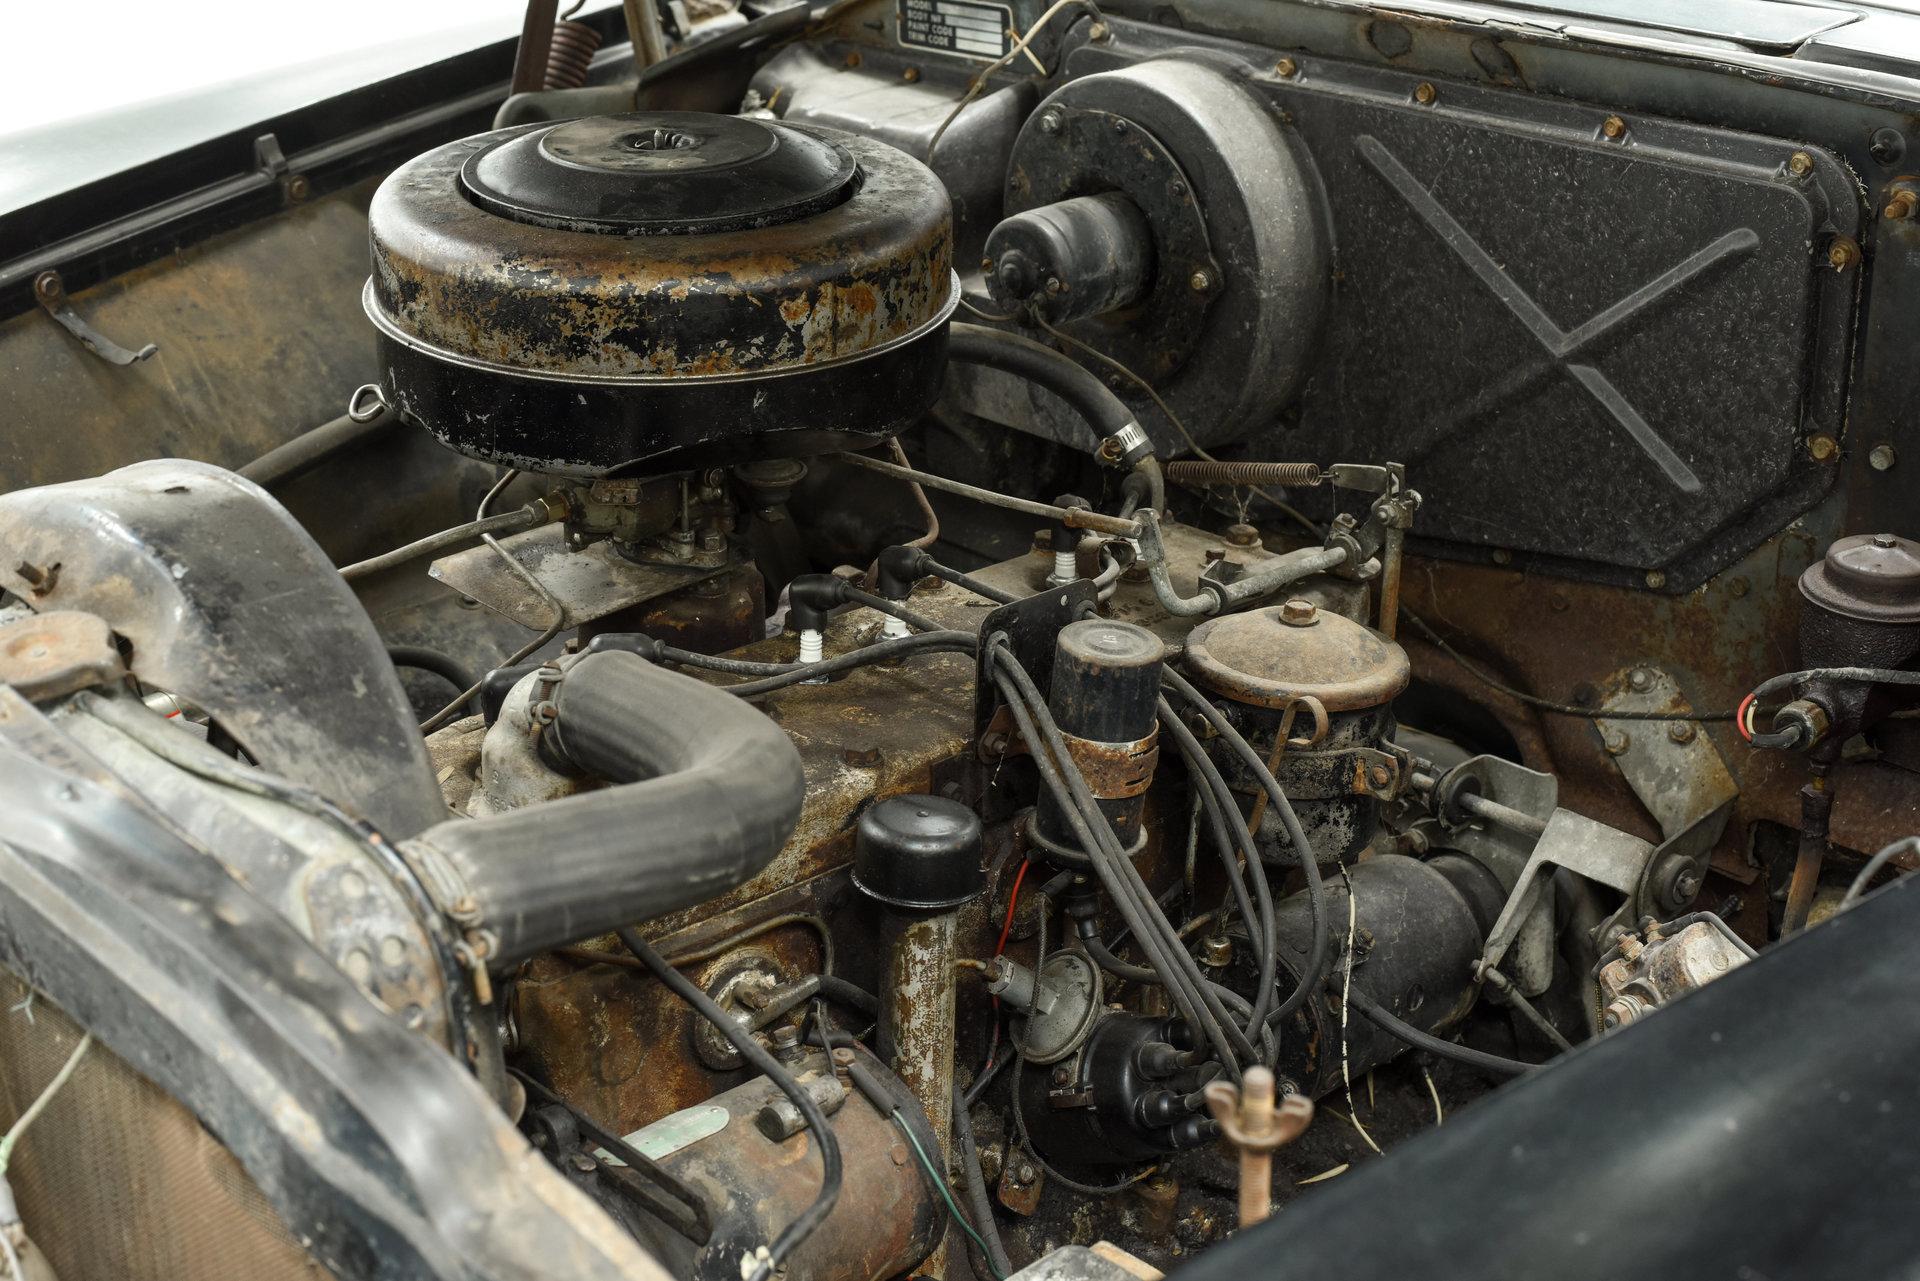 Eb Hd Dodge Regent Sedan on 194 Cid 6 Cylinder Engine